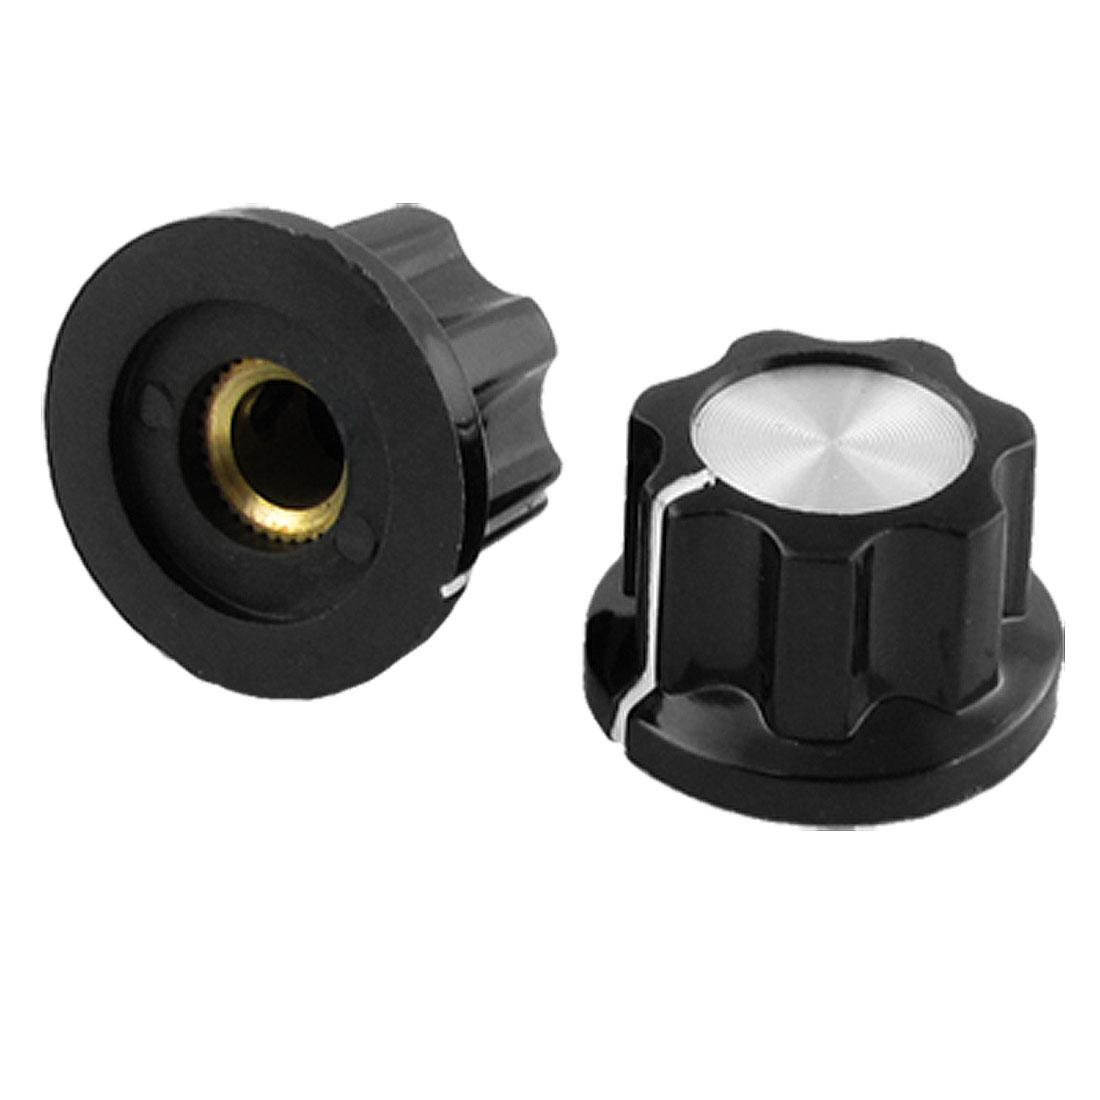 2 x Potentiometer Control Volume Rotary Knob Cap Black